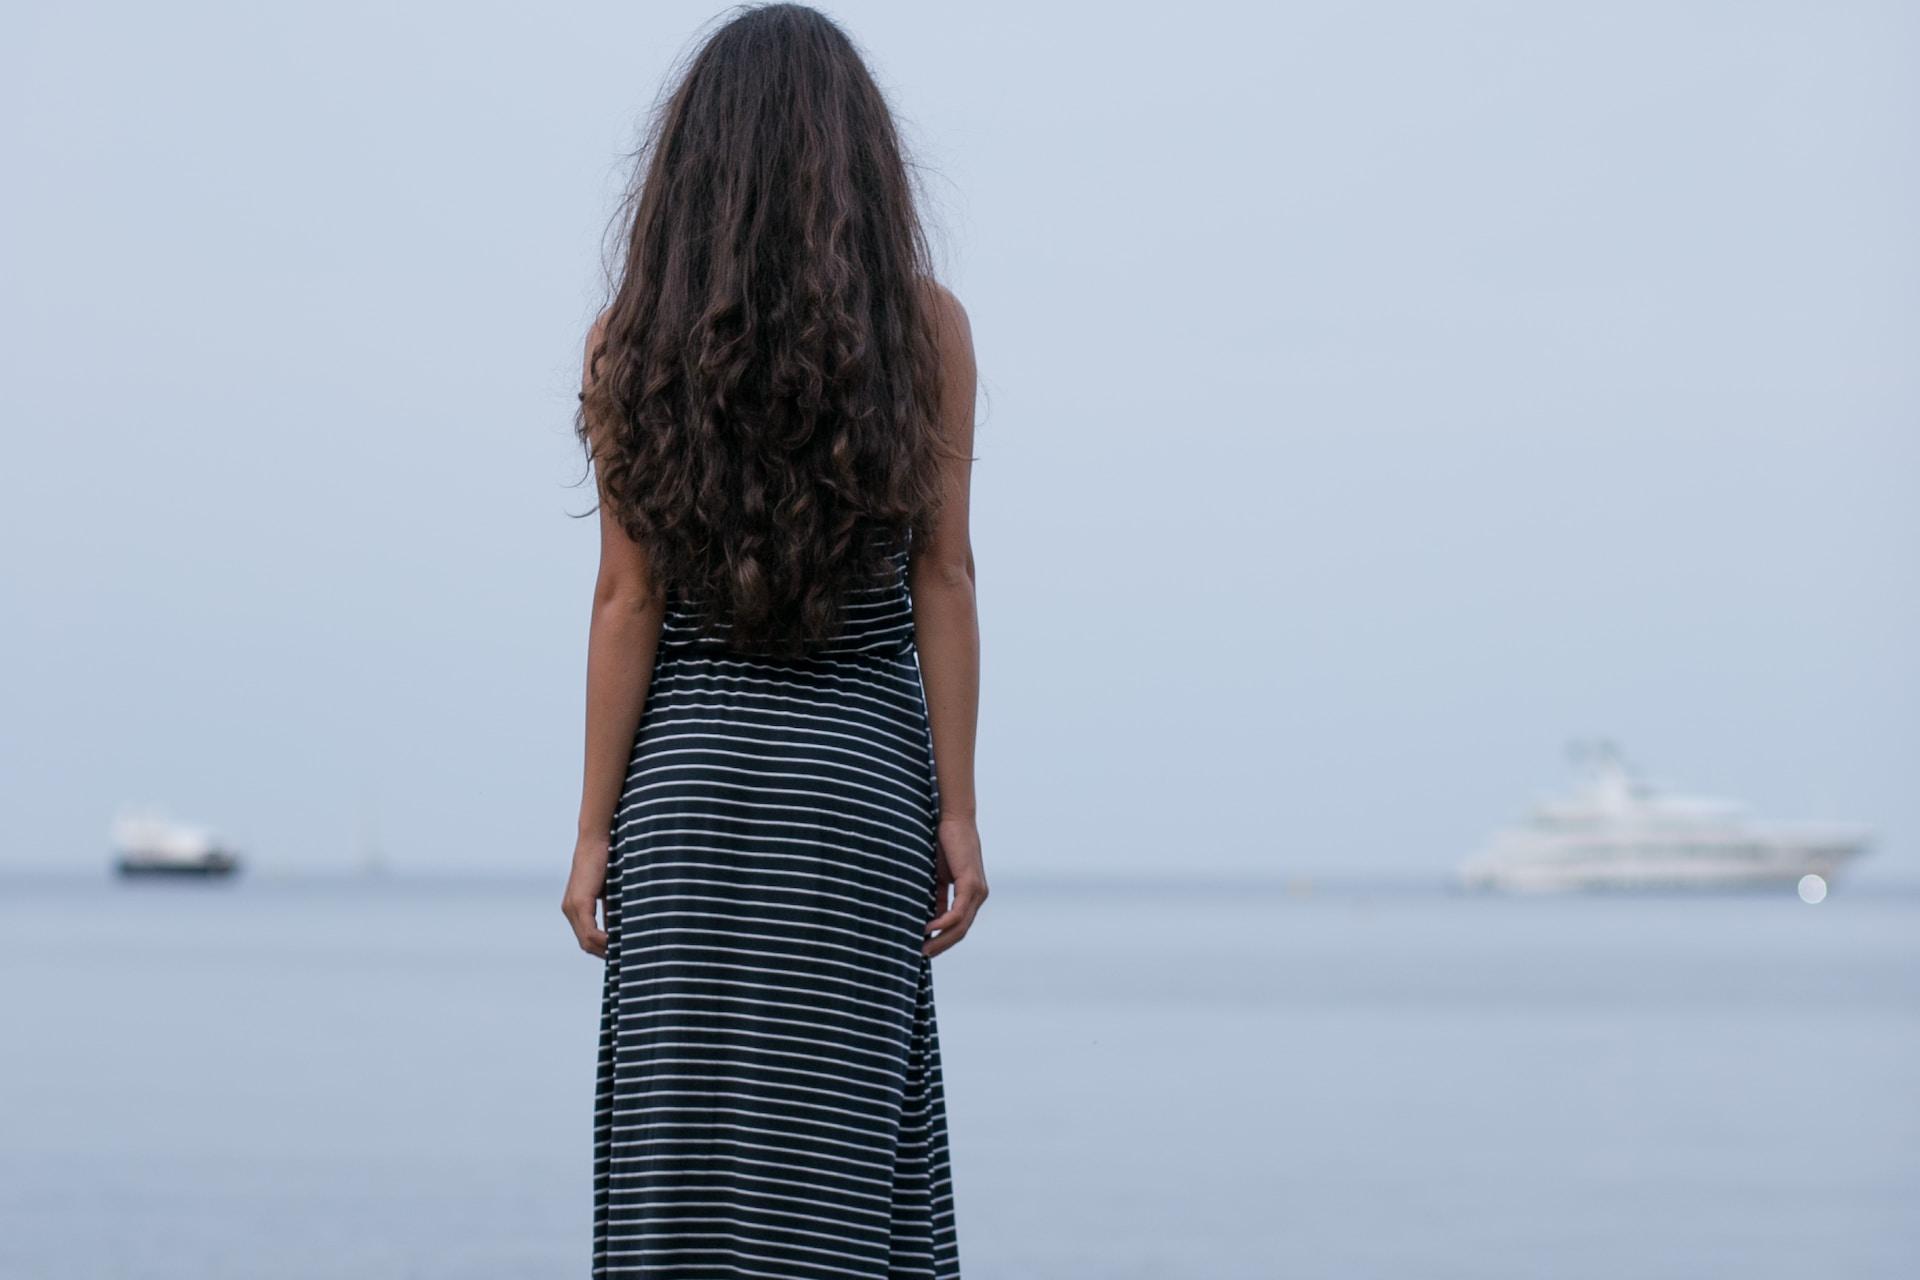 woman standing on gray pavement